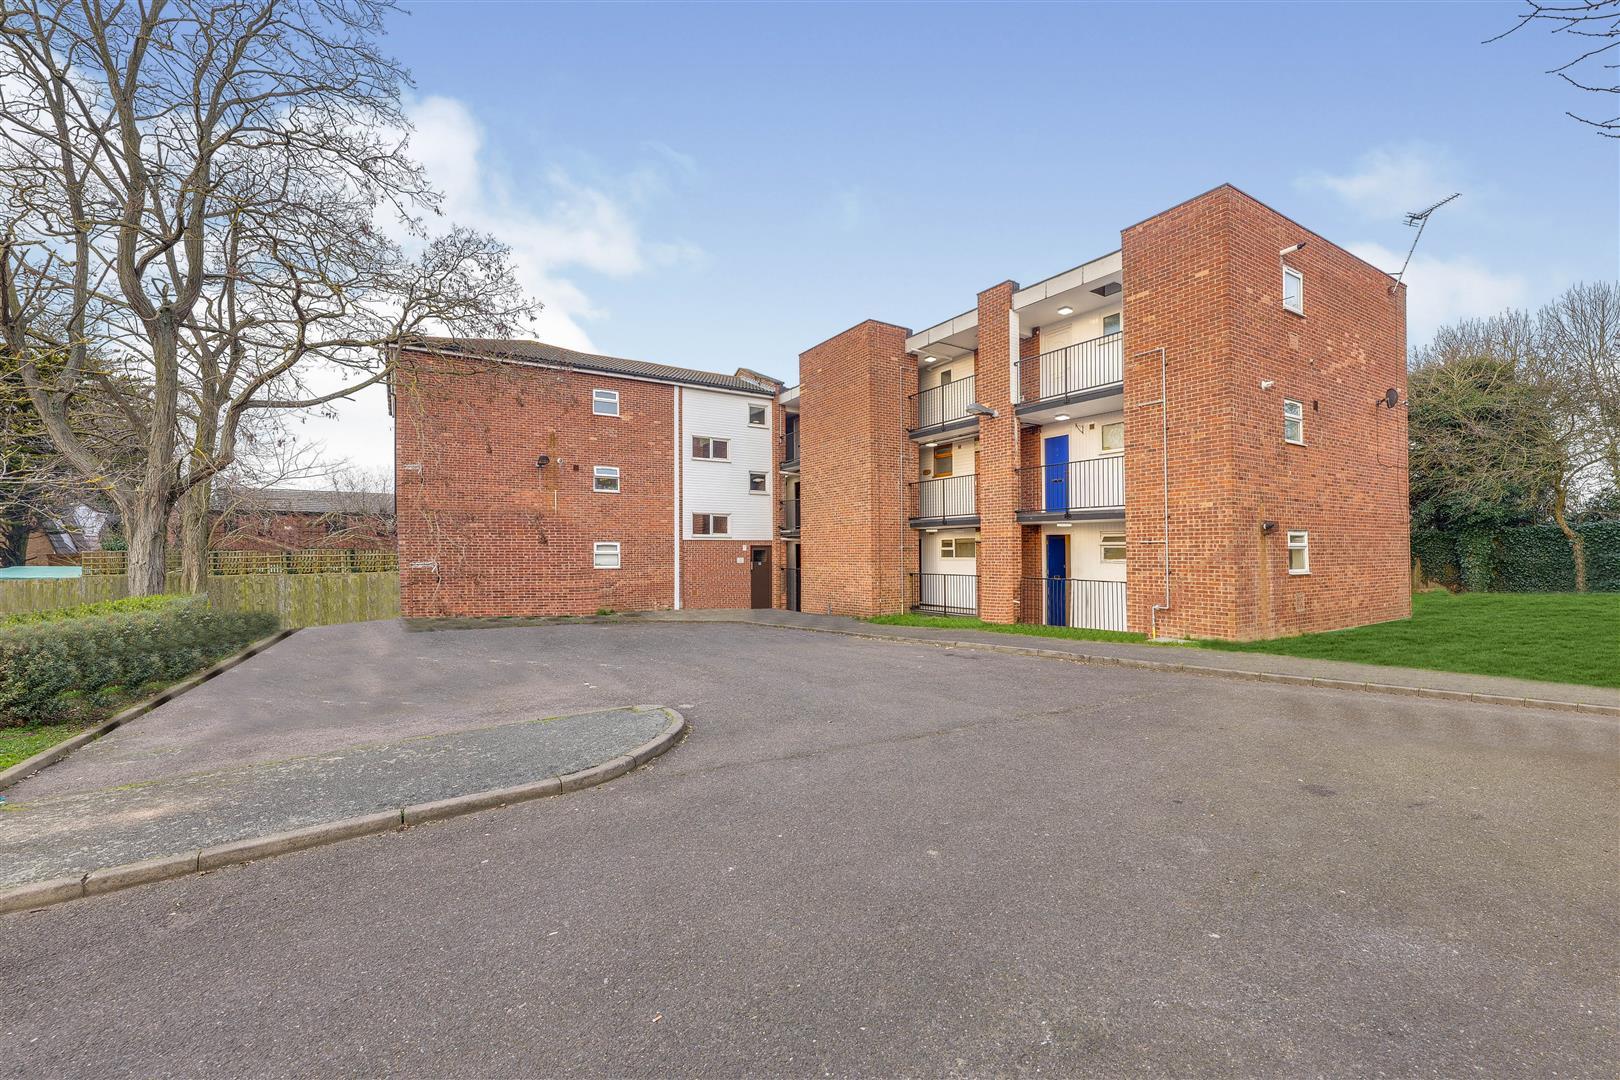 Appleford Court, Basildon